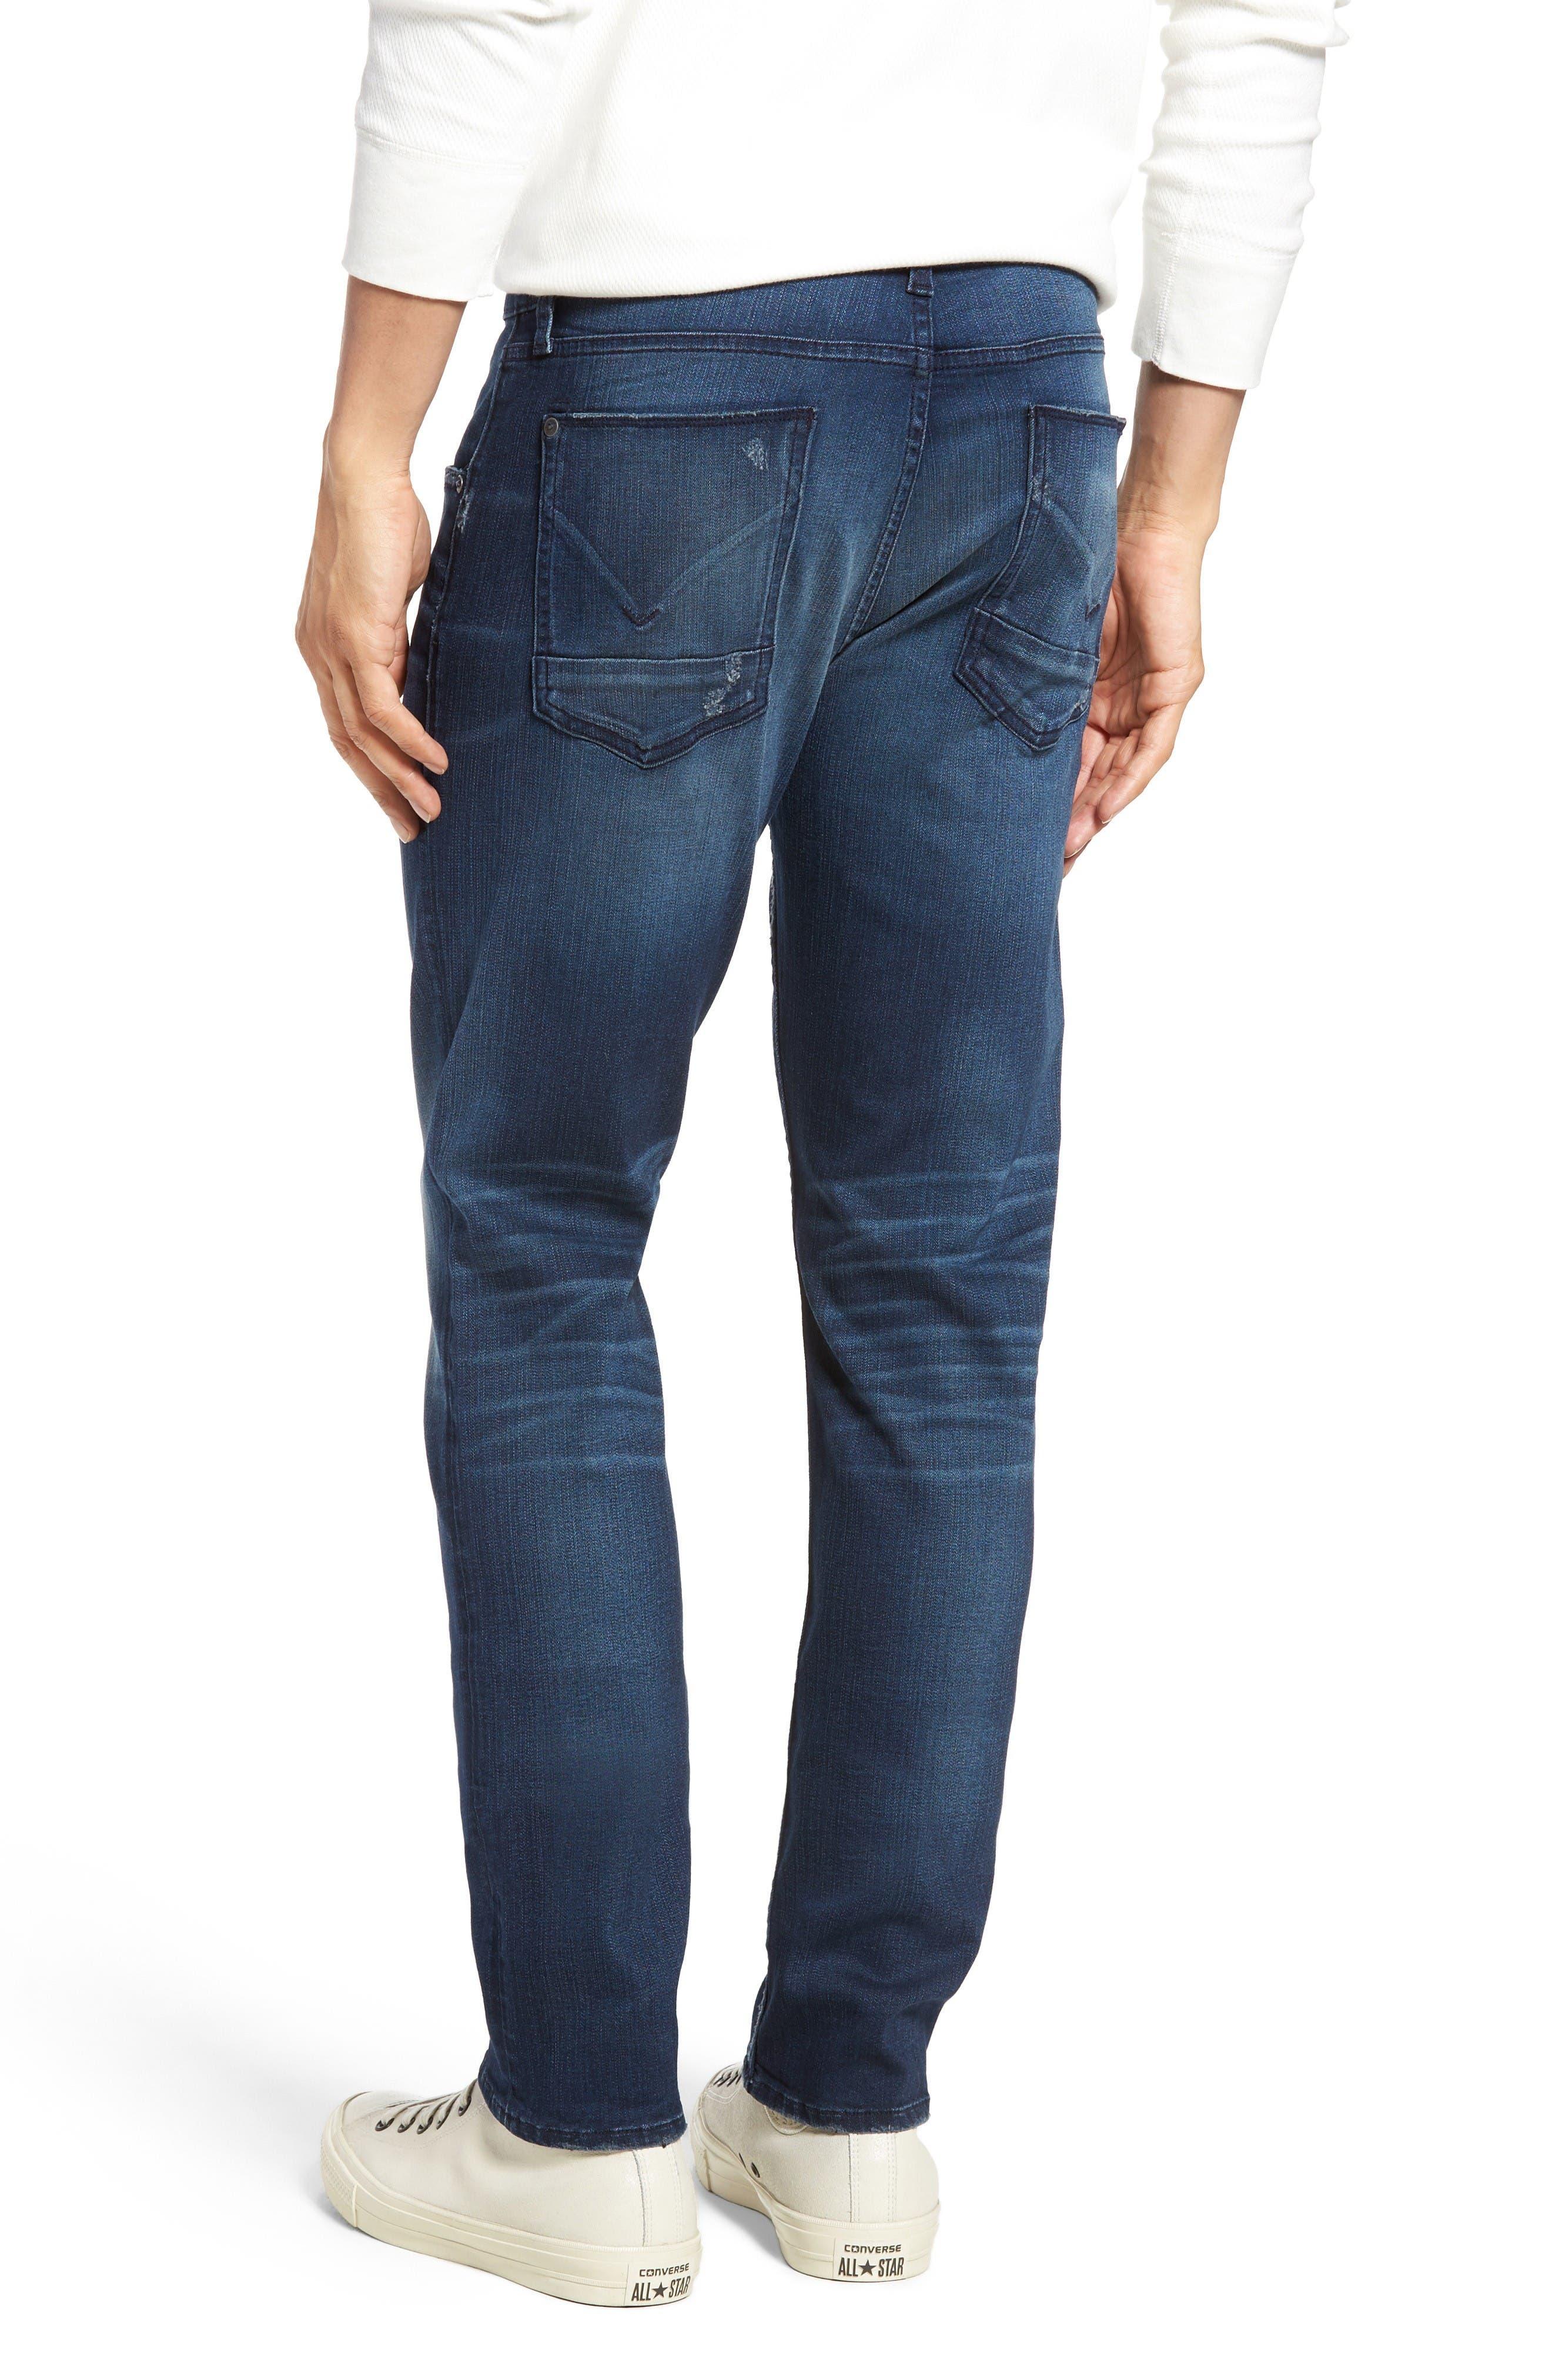 Blake Slim Fit Jeans,                             Alternate thumbnail 2, color,                             Napoleon Blue